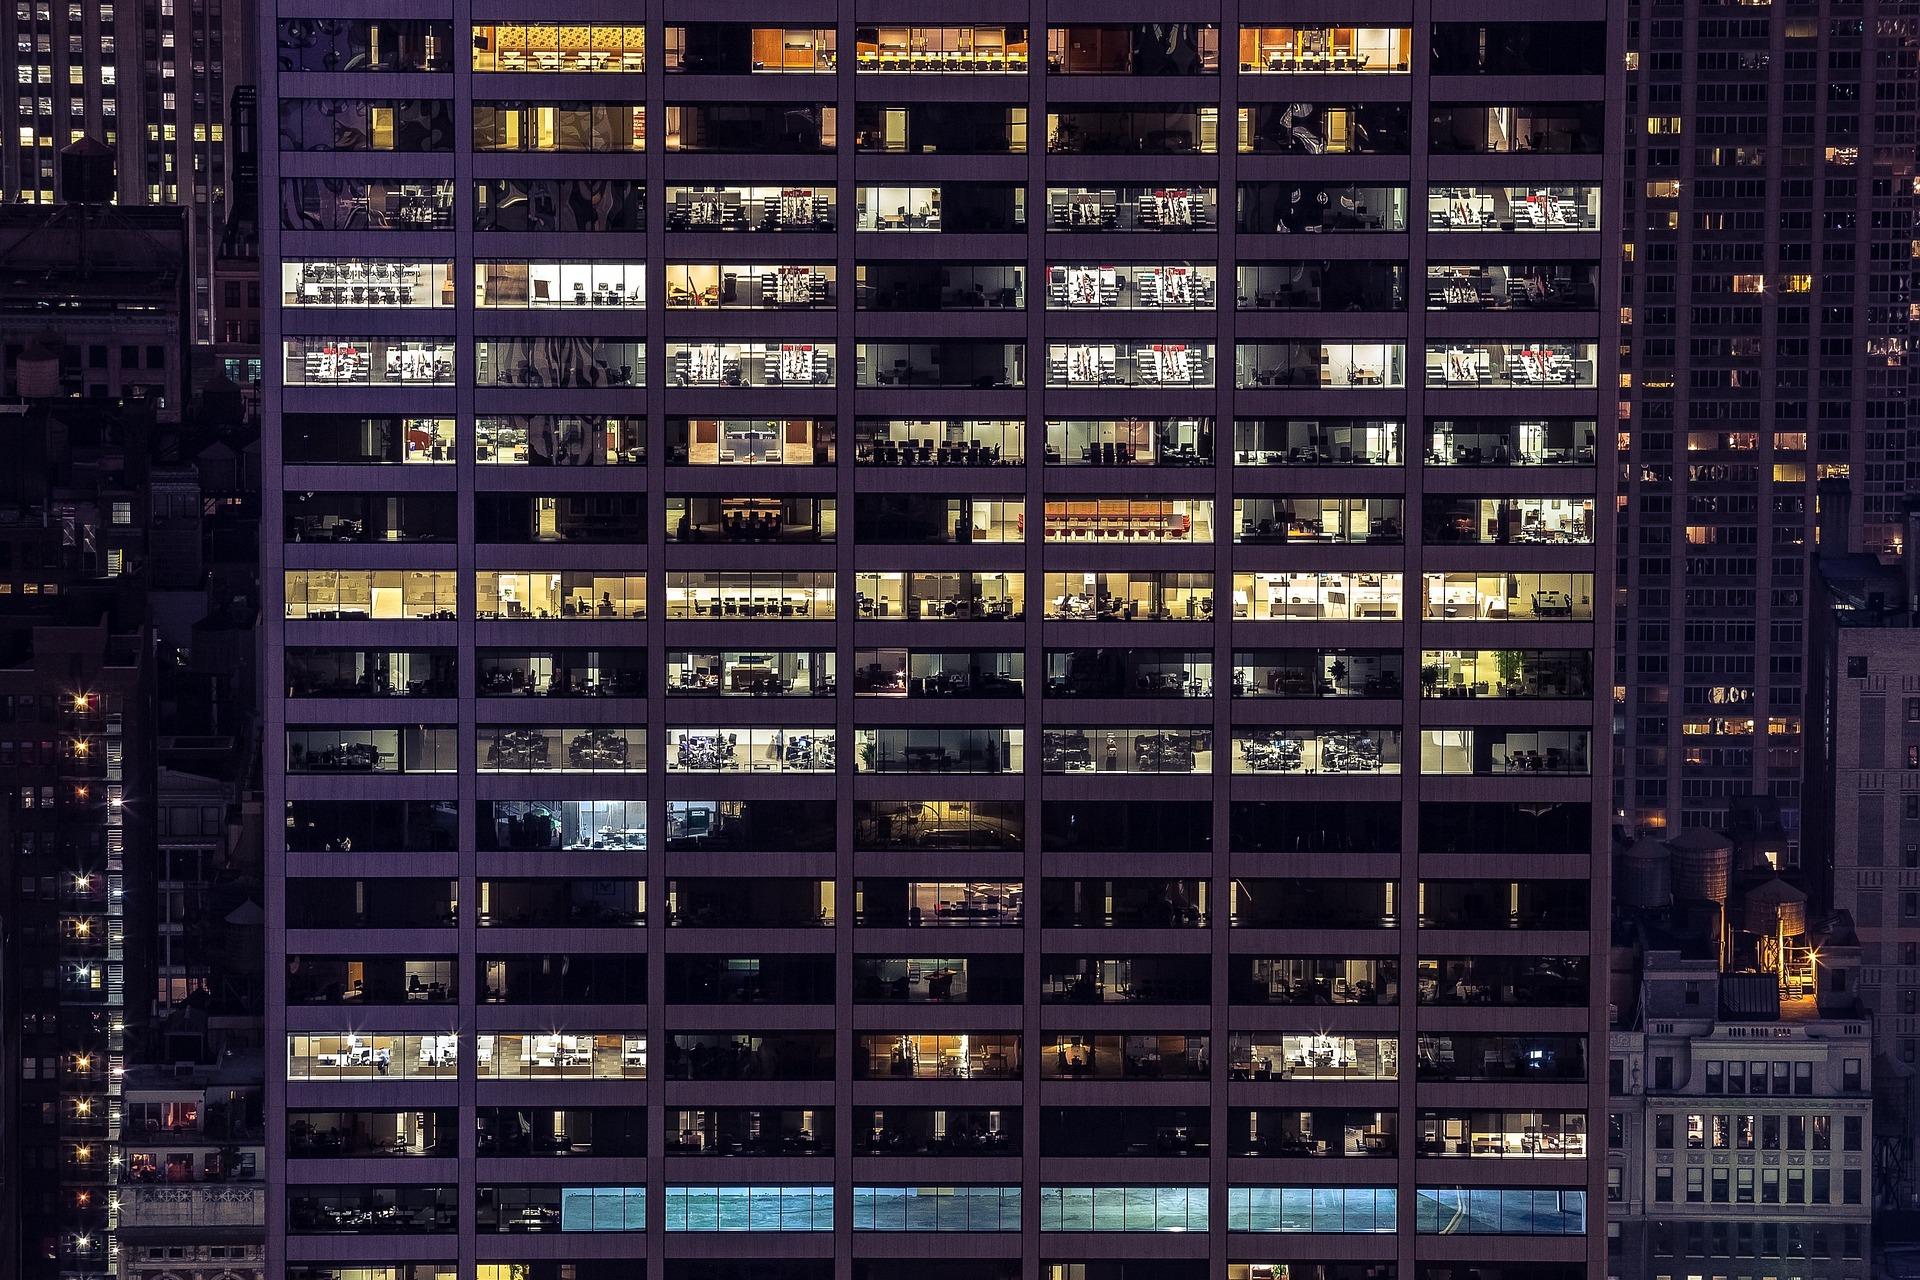 cladire corporatie birouri multinationala afacere mare